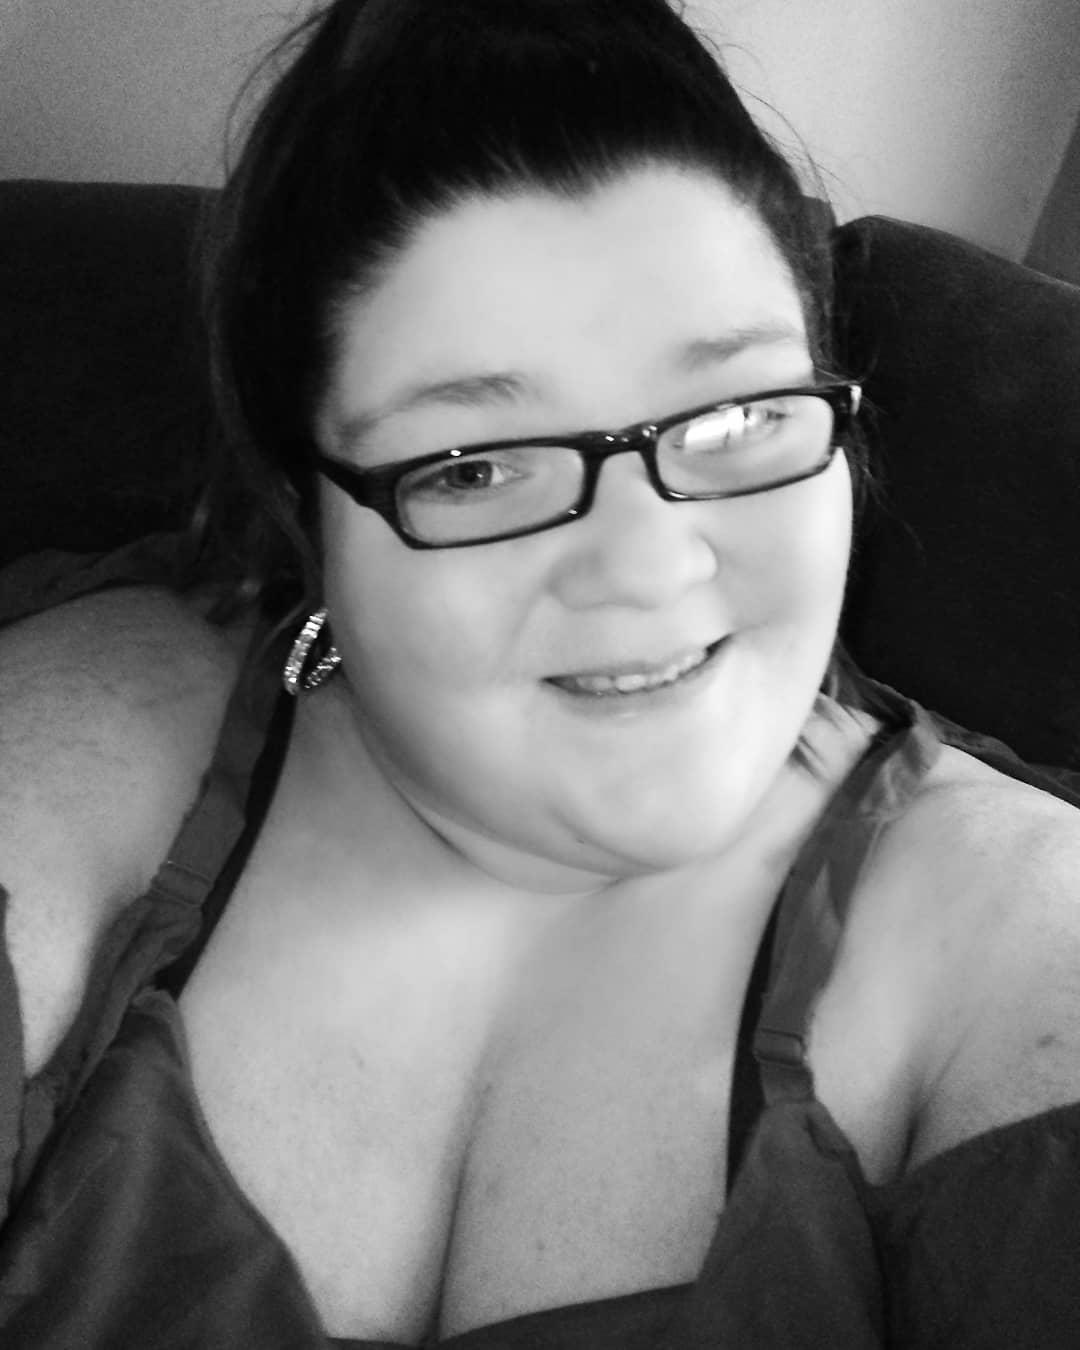 TLC My 600 Pound Life Gina Krasley Update After Photos